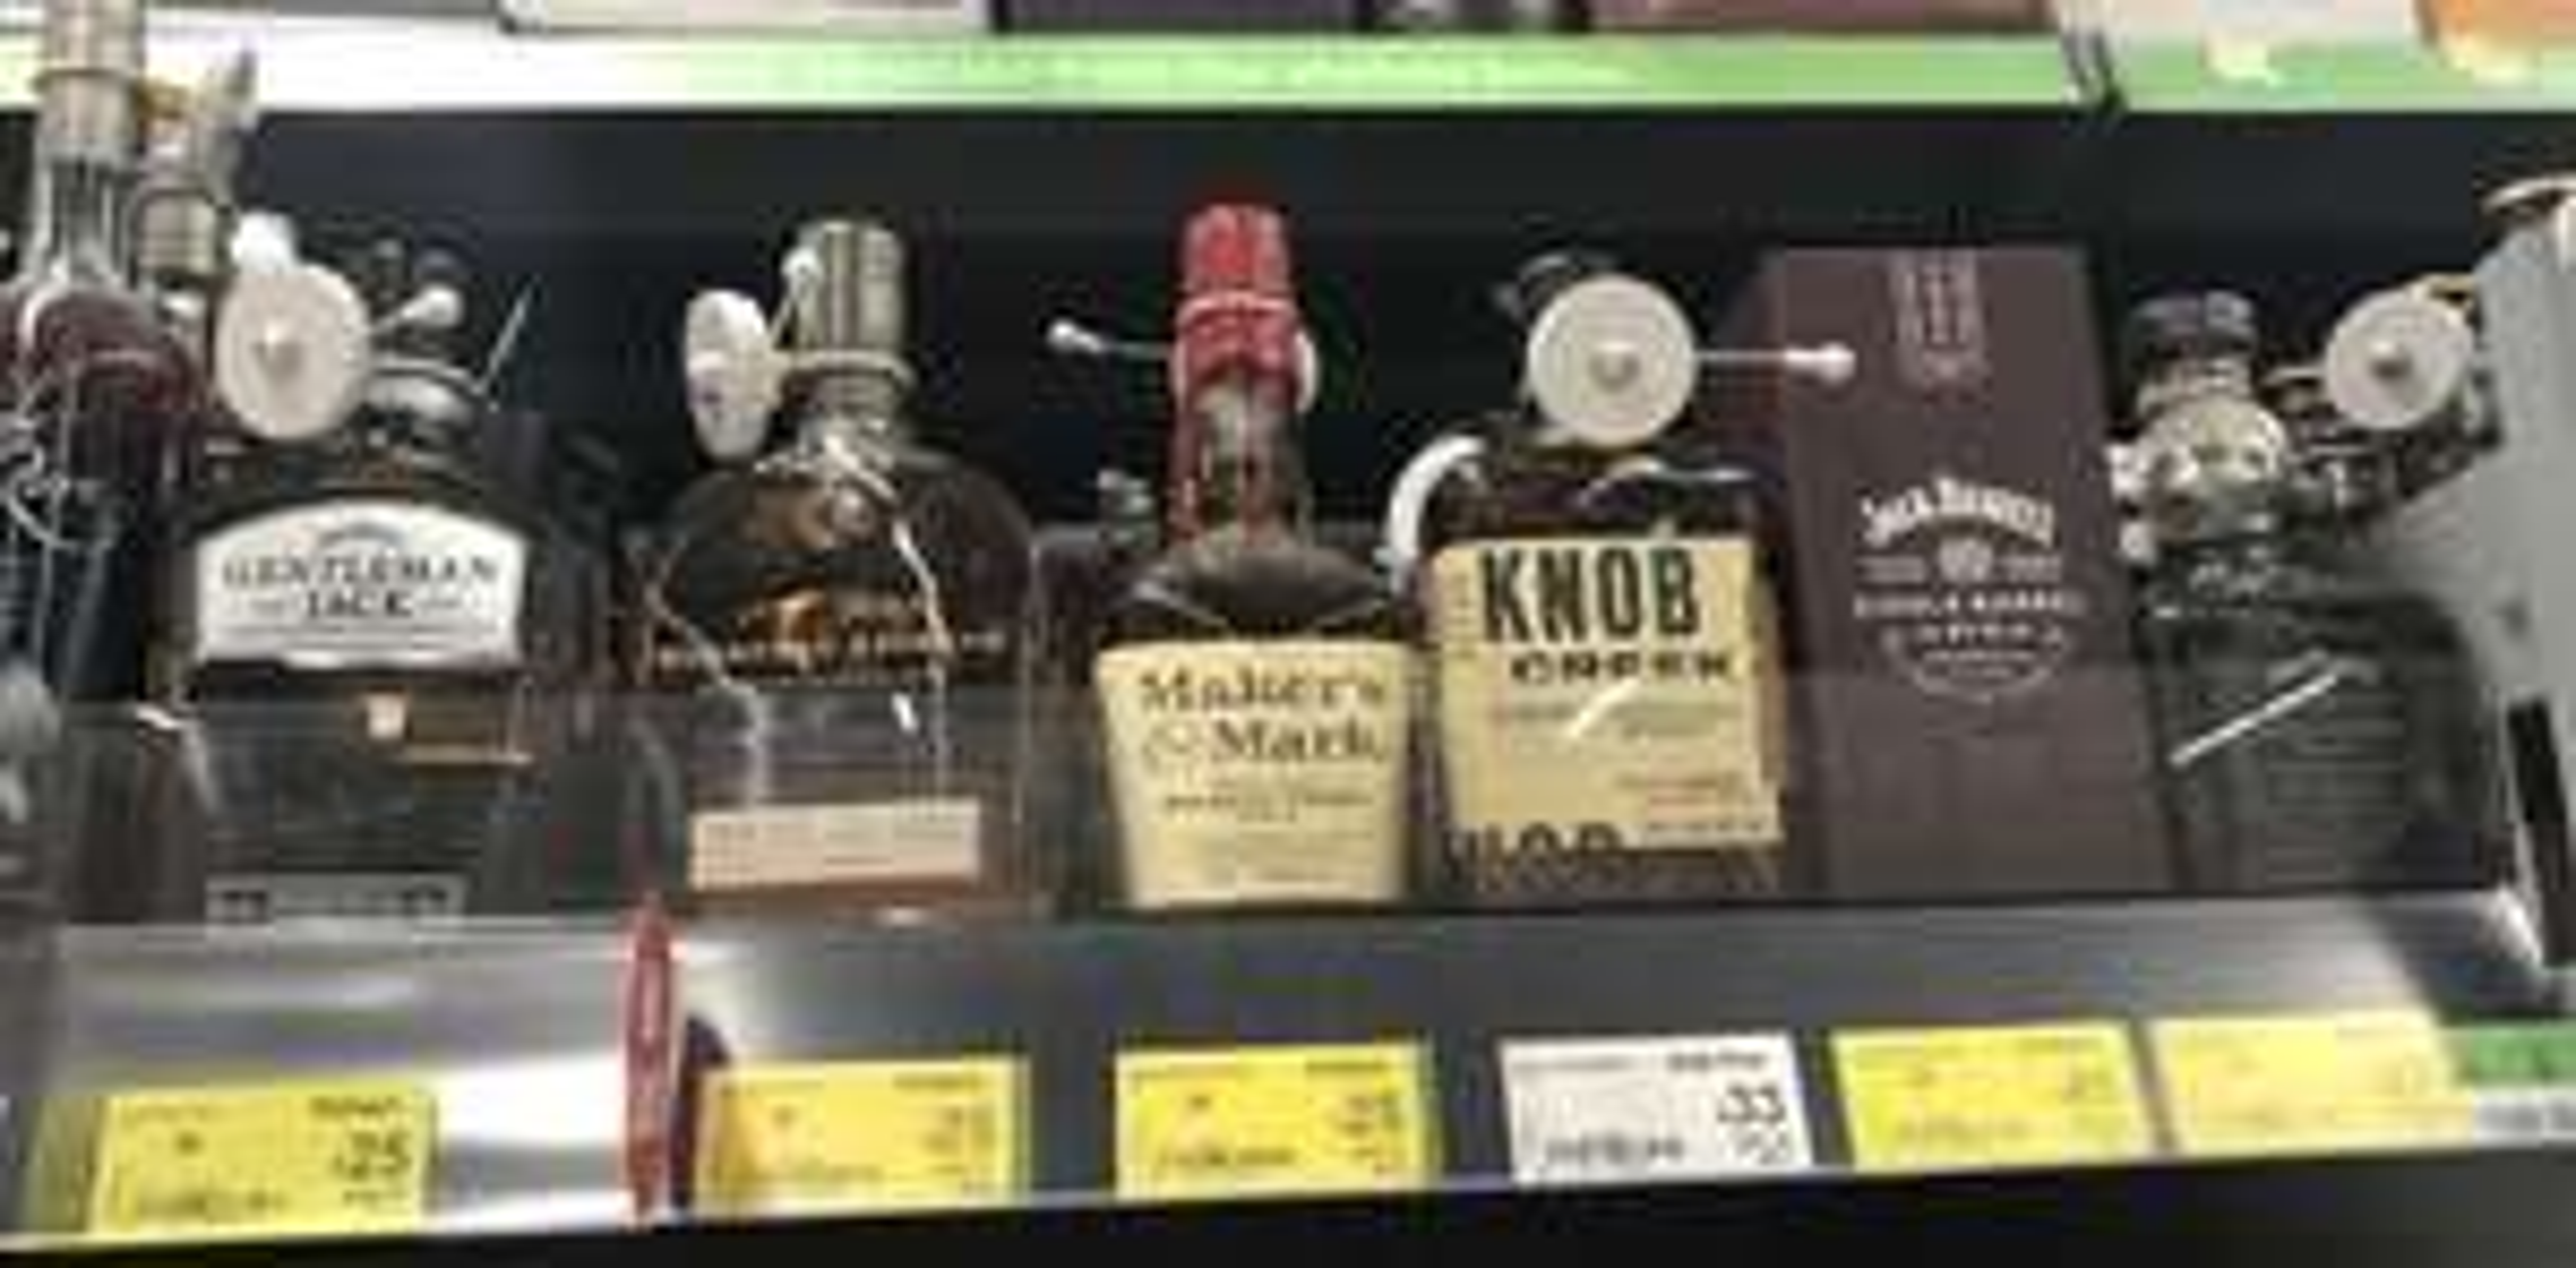 Various Jack Daniels Reduced Asda Motherwell e.g Gentleman Jack 70cl- Was £32, Now £25